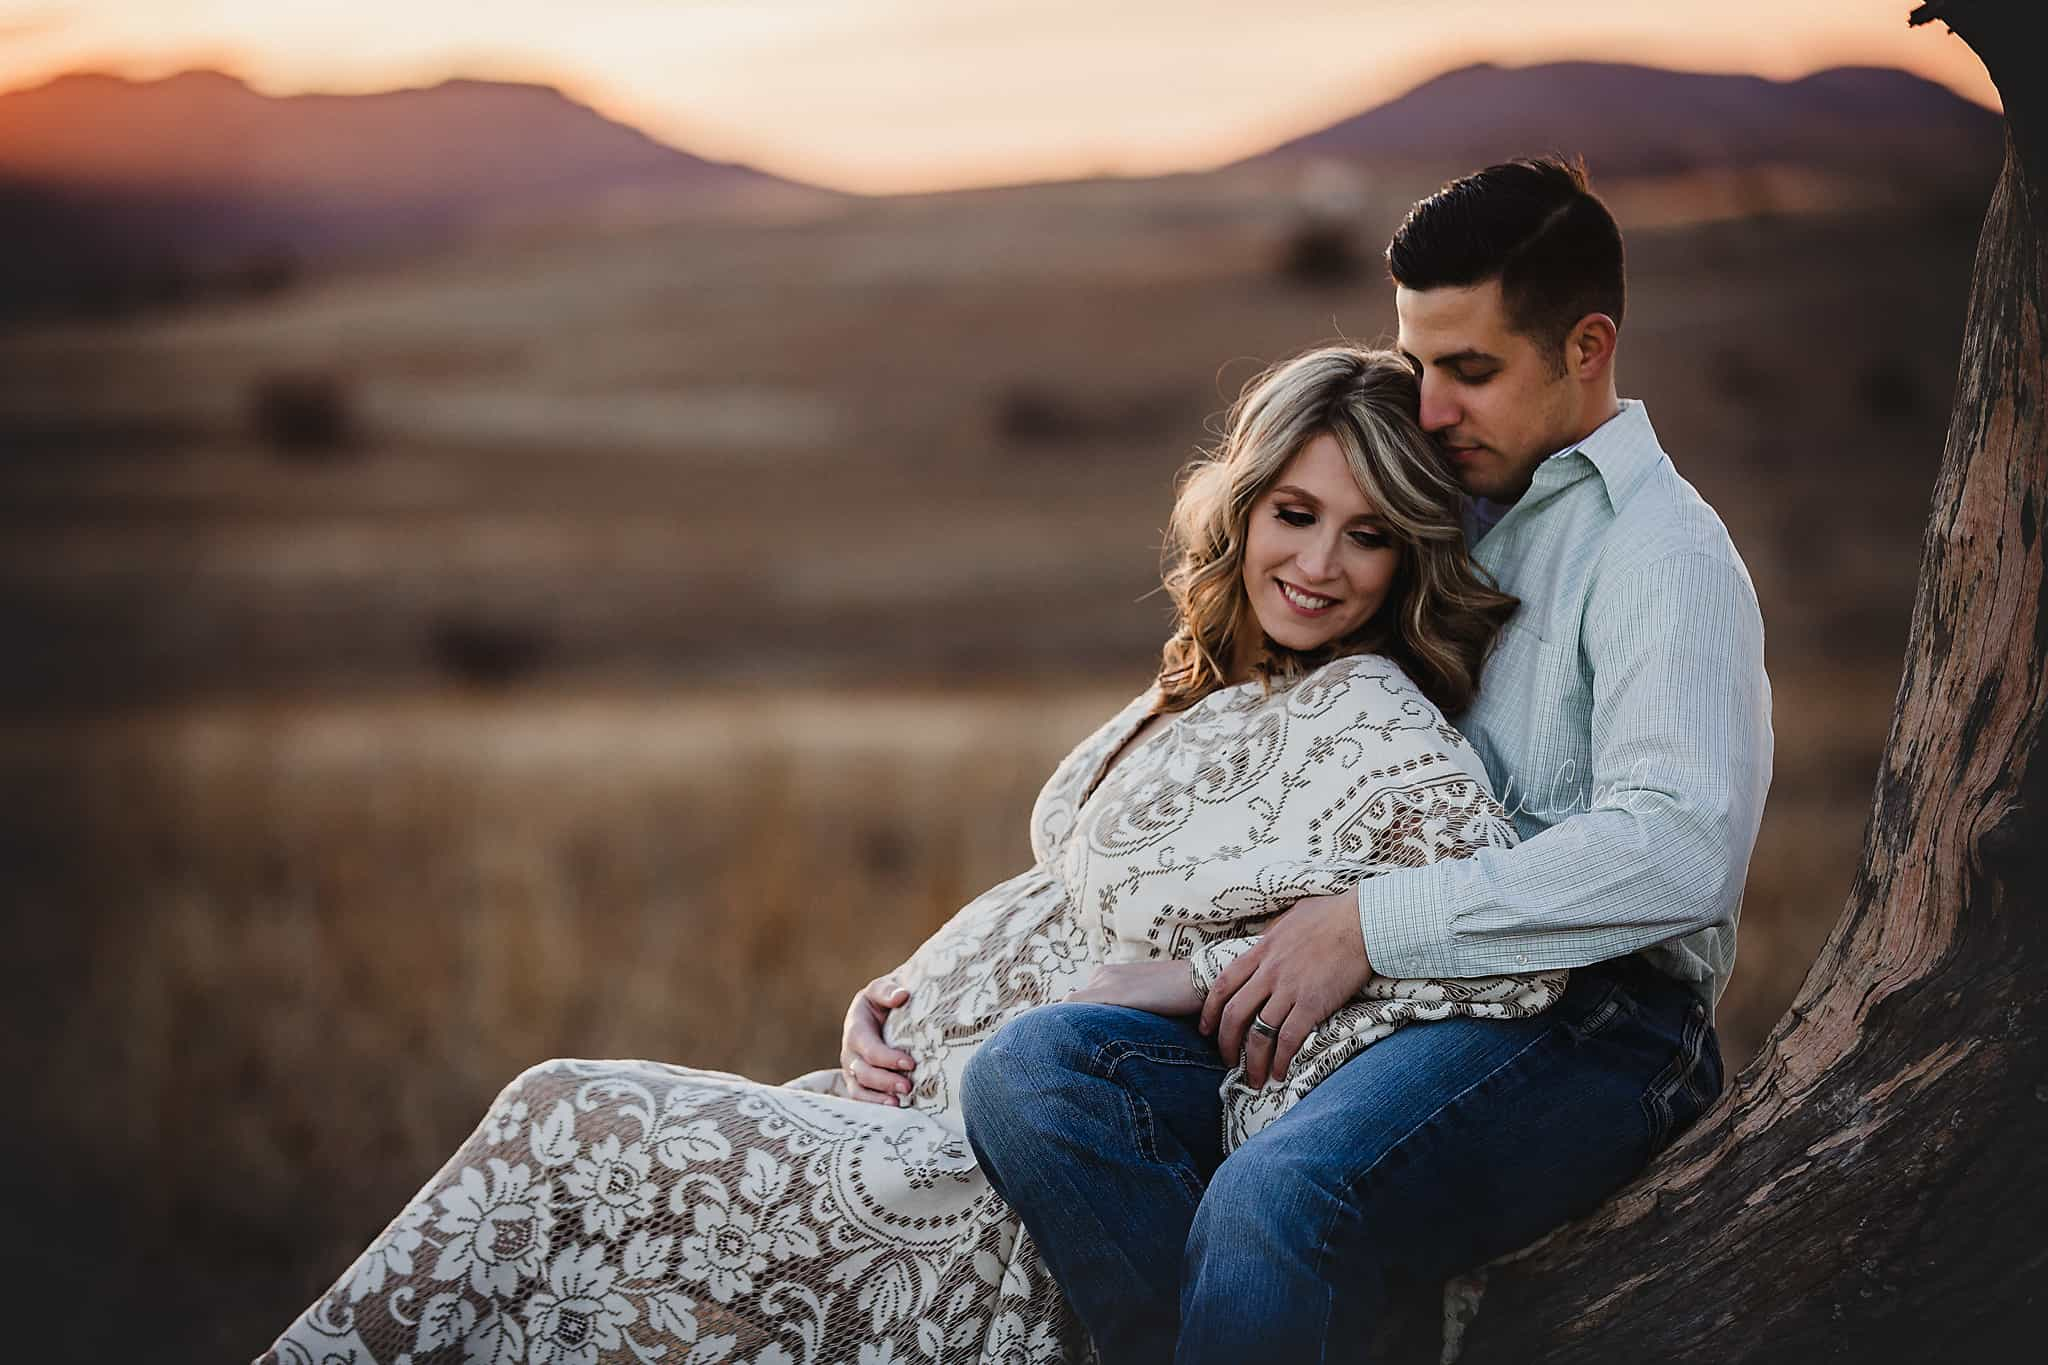 lawton photographers, lawton photographer, wichita falls maternity photography, okc maternity photographer, okc photographers, altus photographer, altus maternity photographer